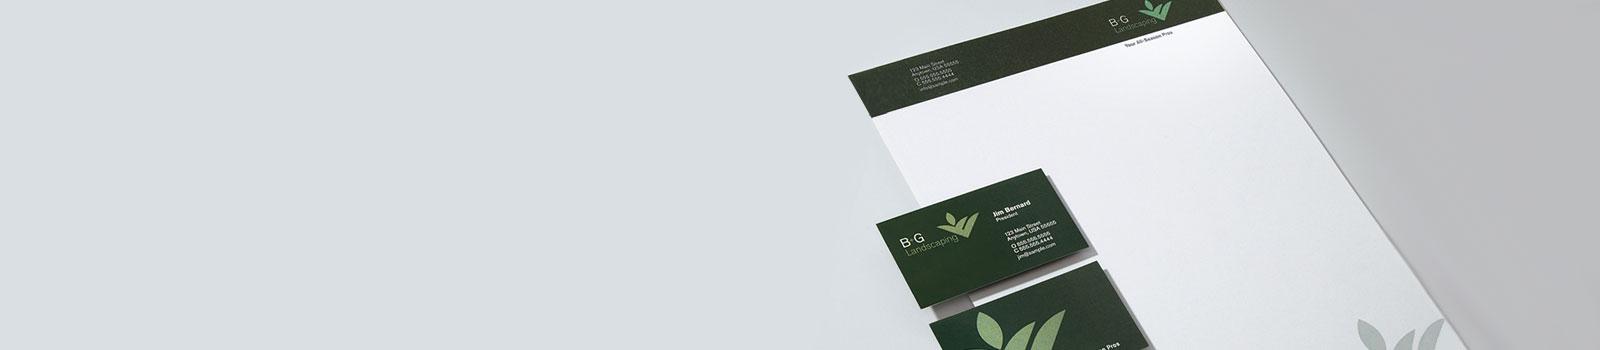 Business Cards & Stationery | The UPS Store #516, Saskatoon ...